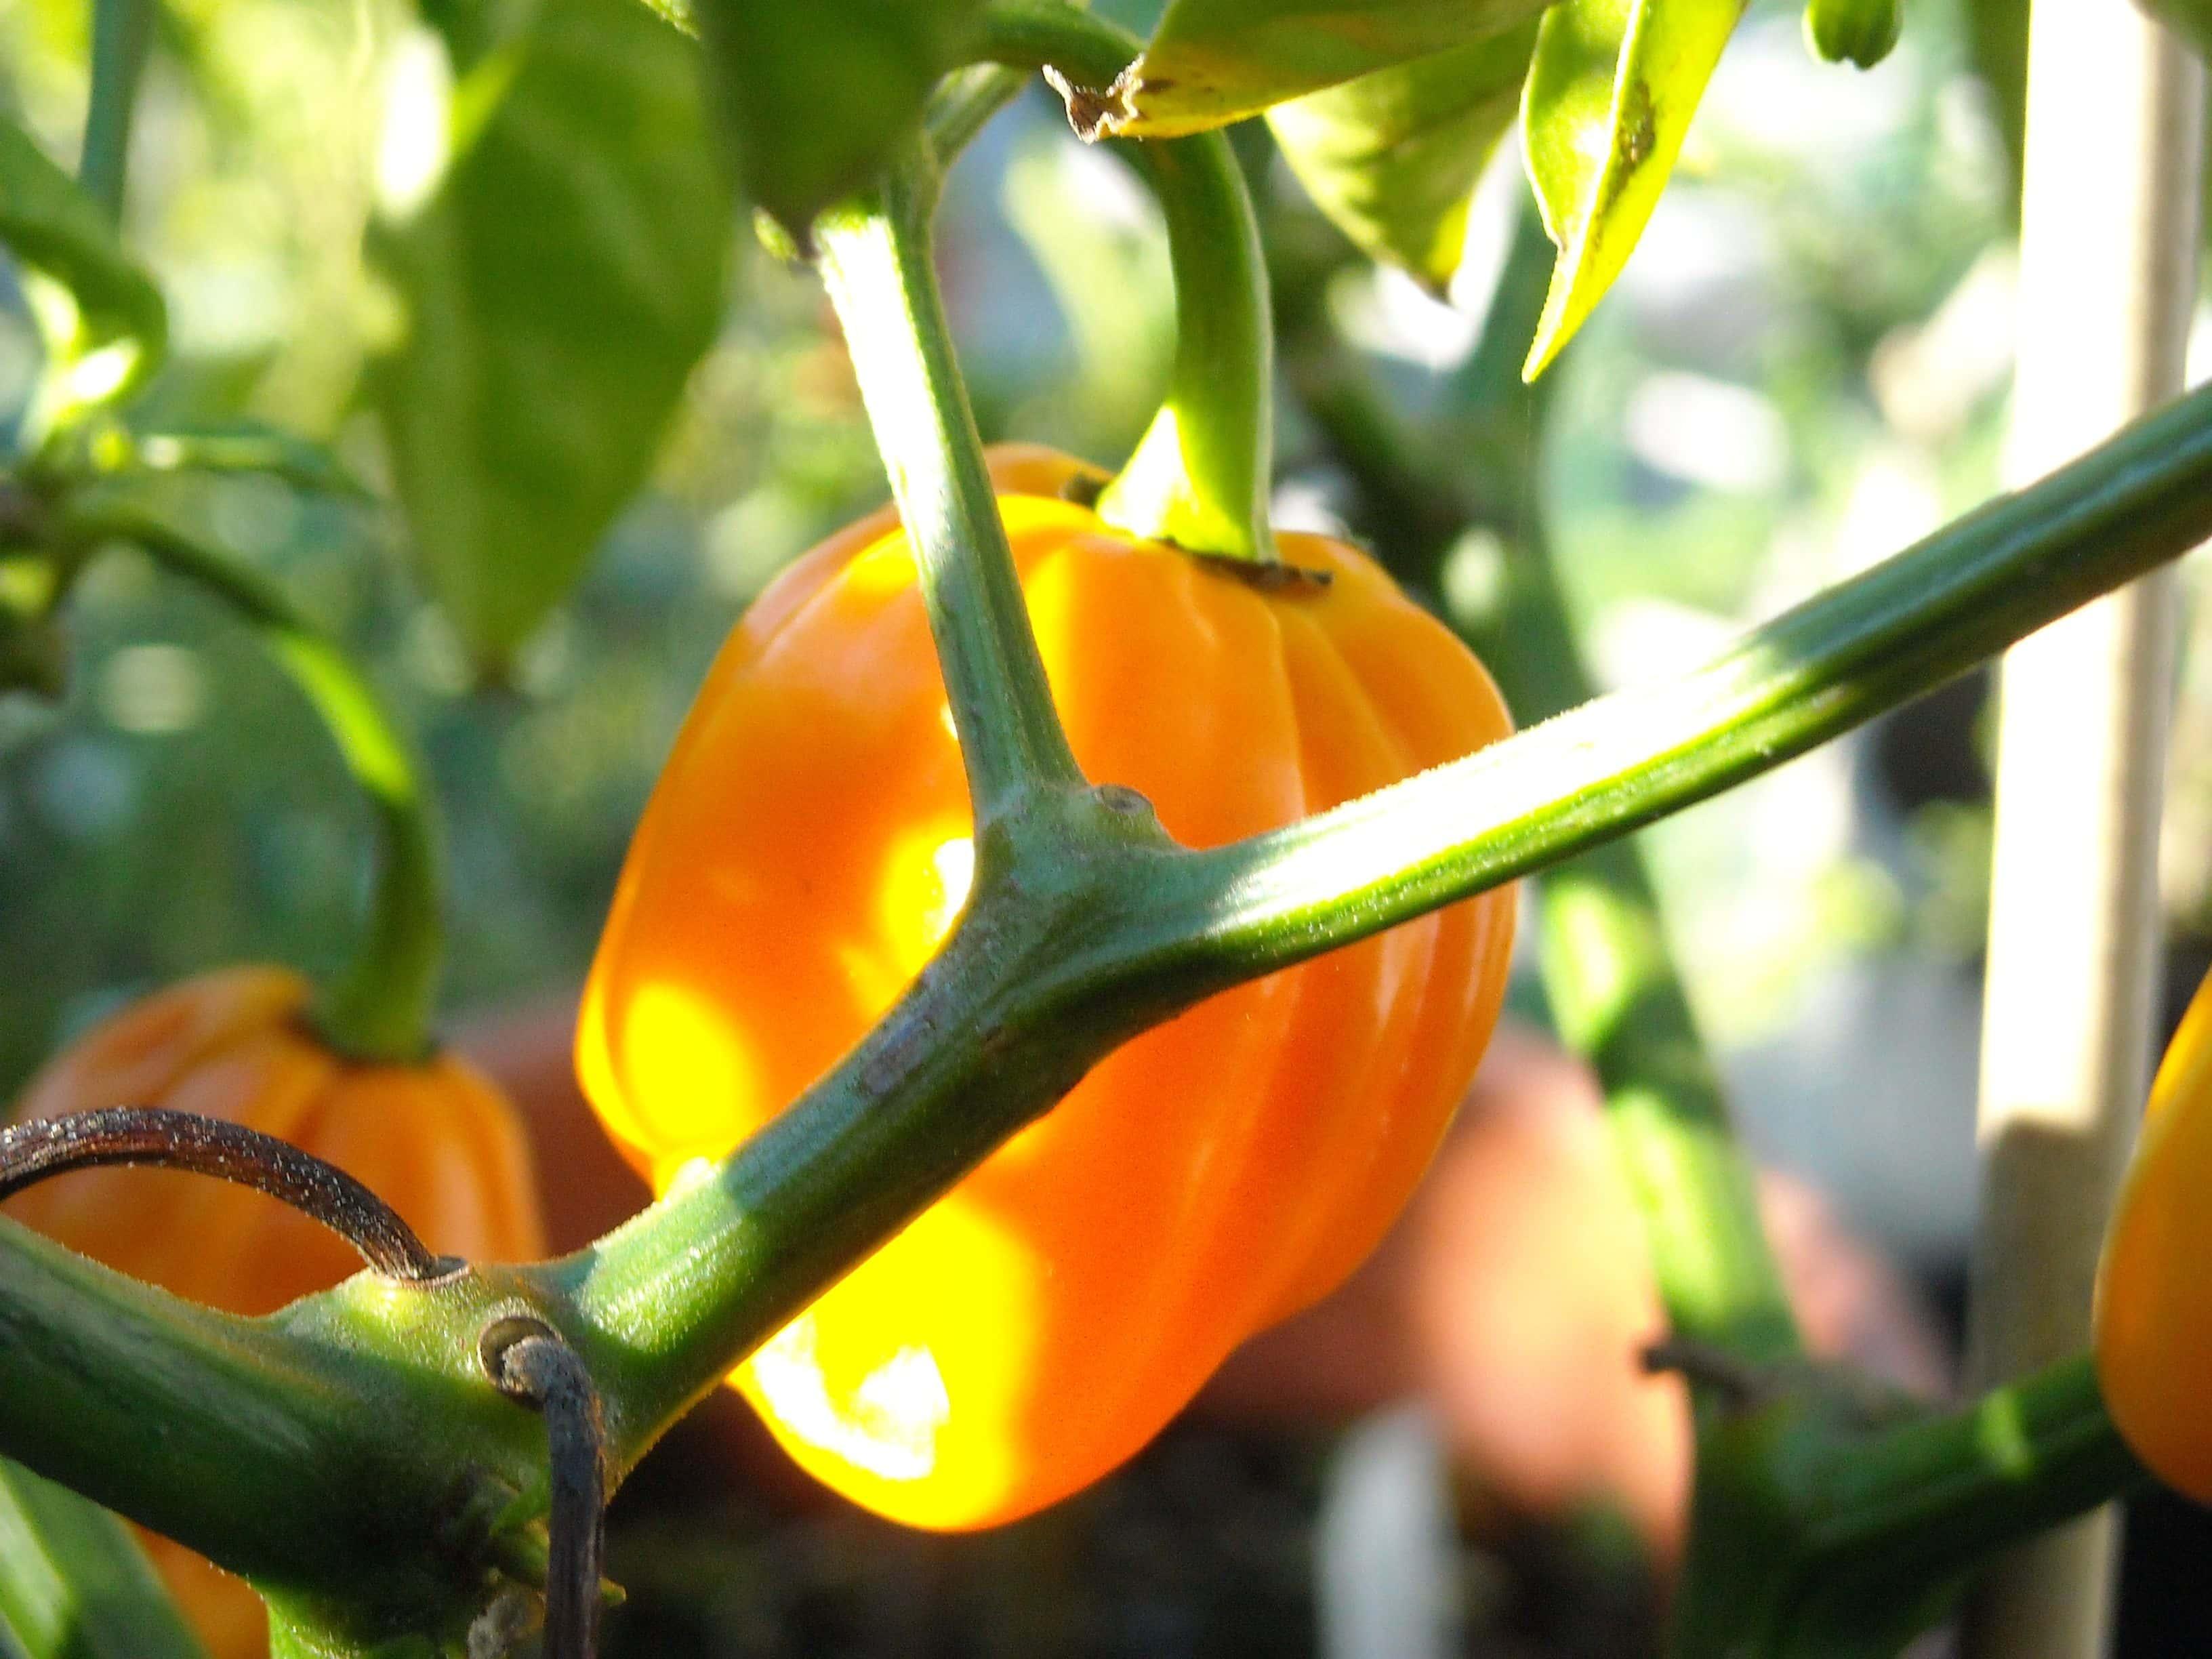 Pumpkin habanero on the vine